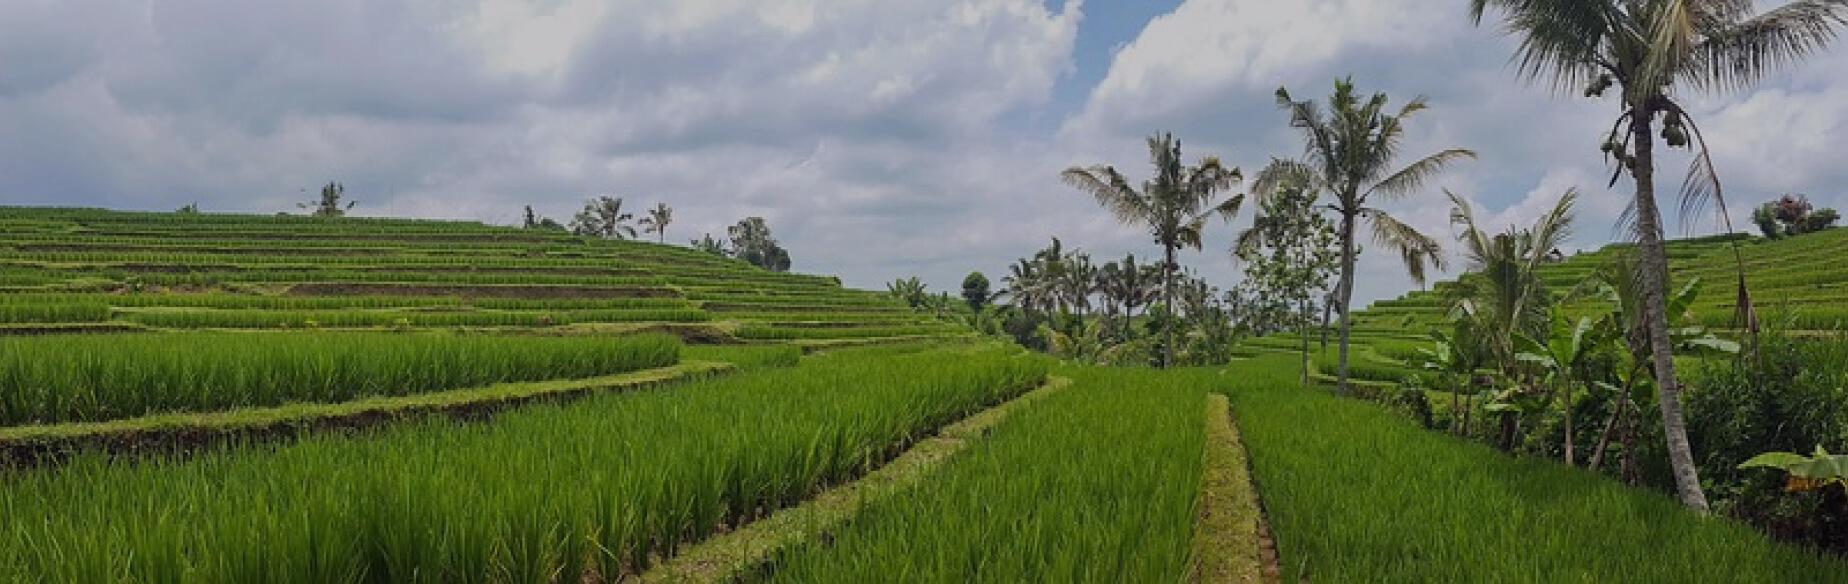 Green rice fields in Canggu, Bali, Indonesia